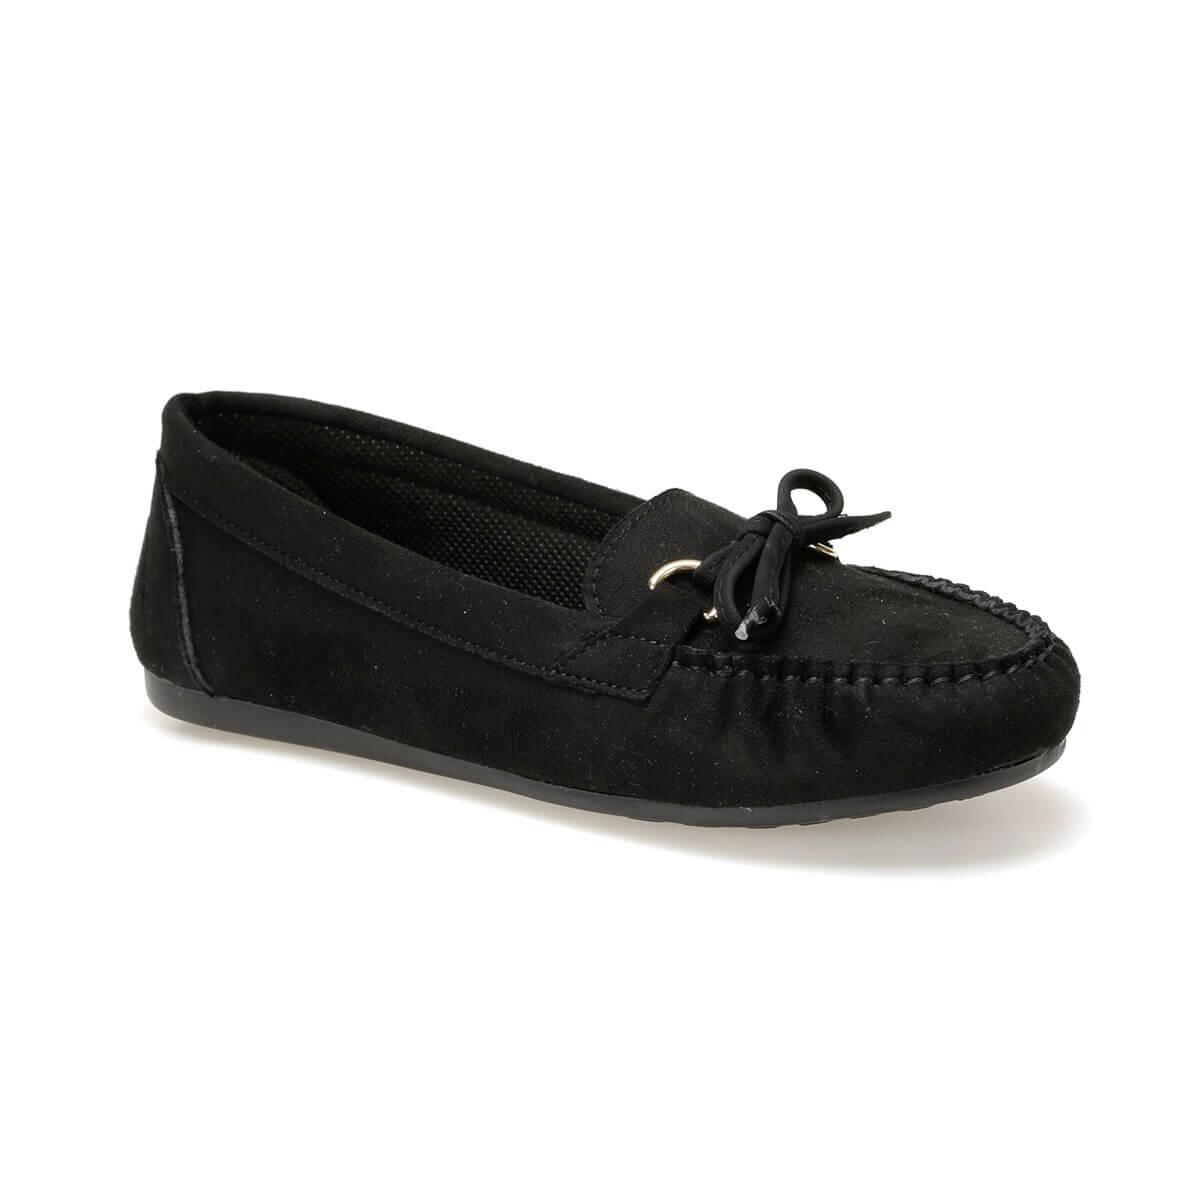 Flo dw19007 sapatos femininos pretos miss f